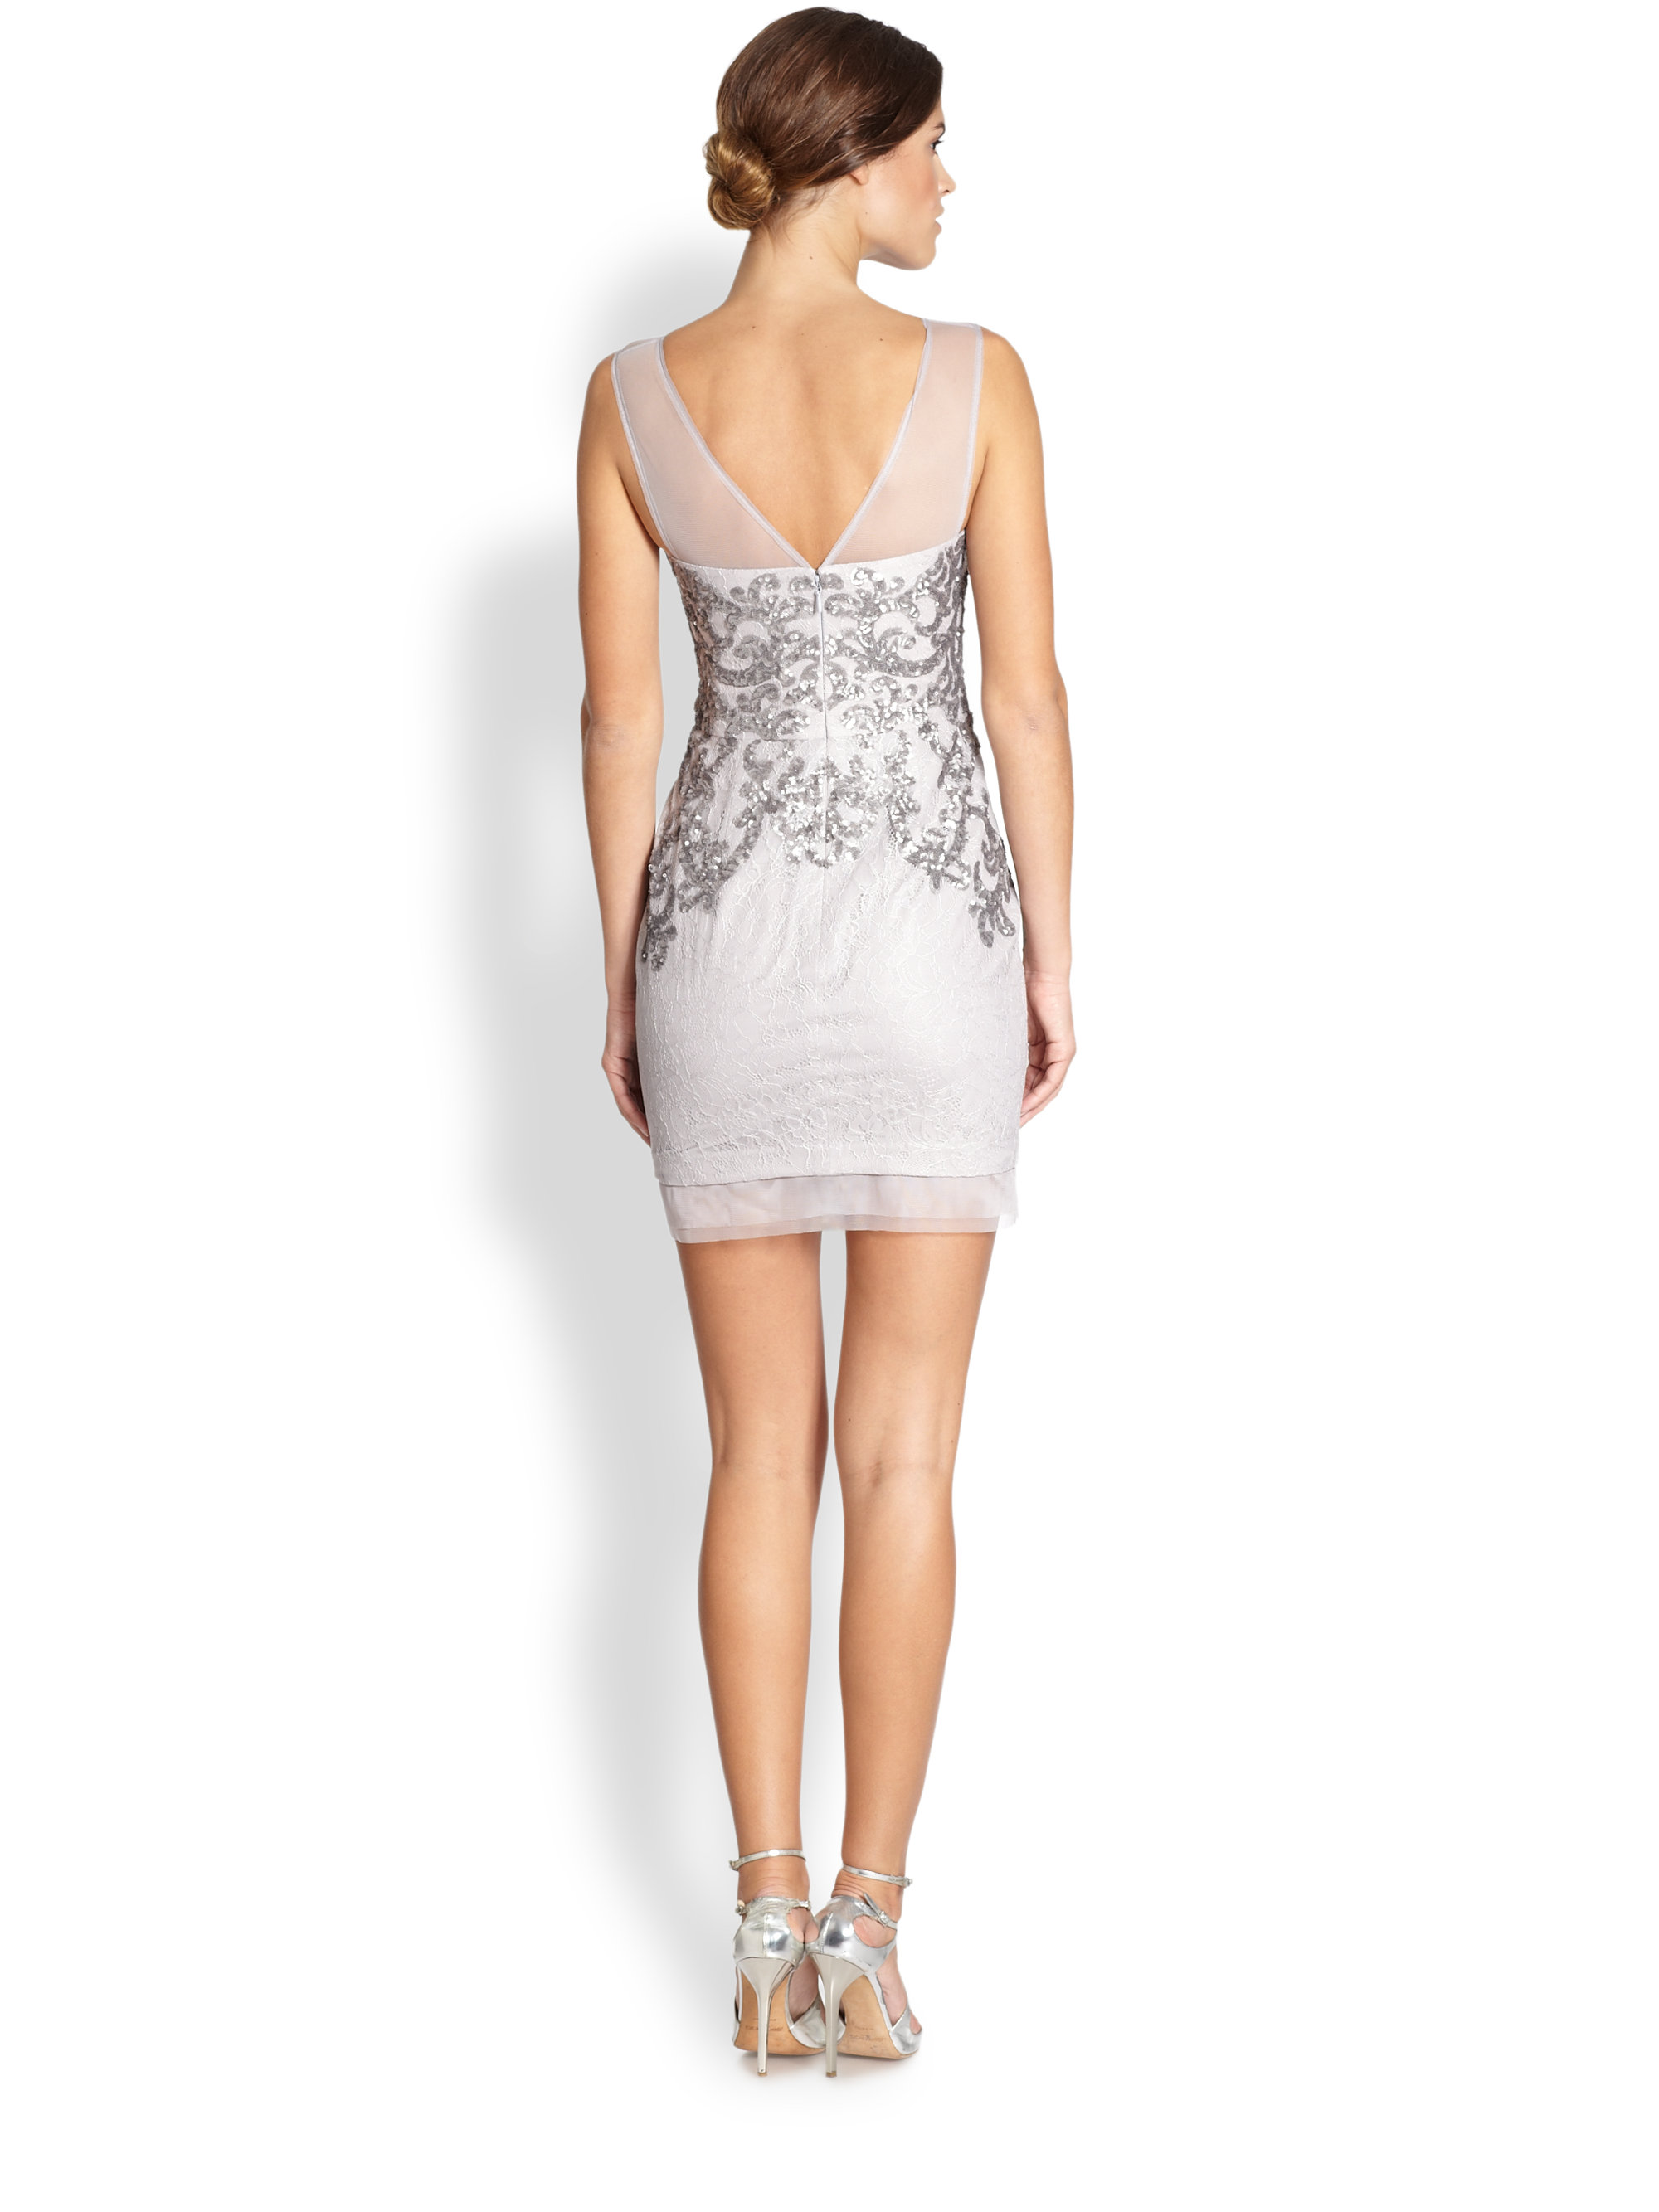 Cocktail dresses bcbg – Dress ideas